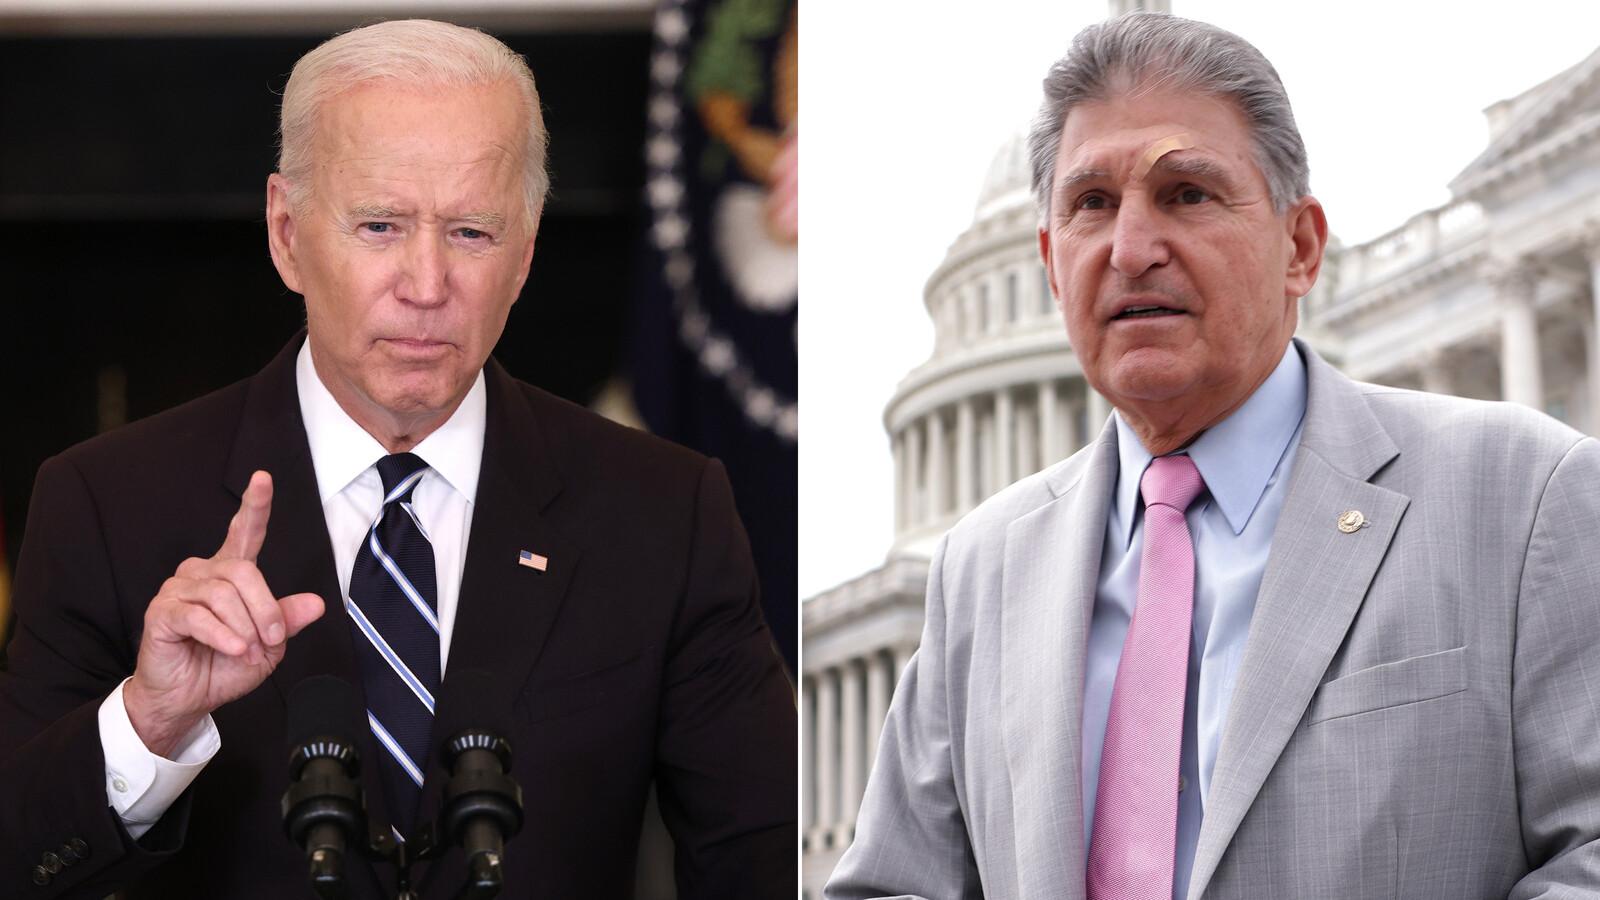 Biden agenda faces make-or-break moment as Democrats struggle to finalize deal